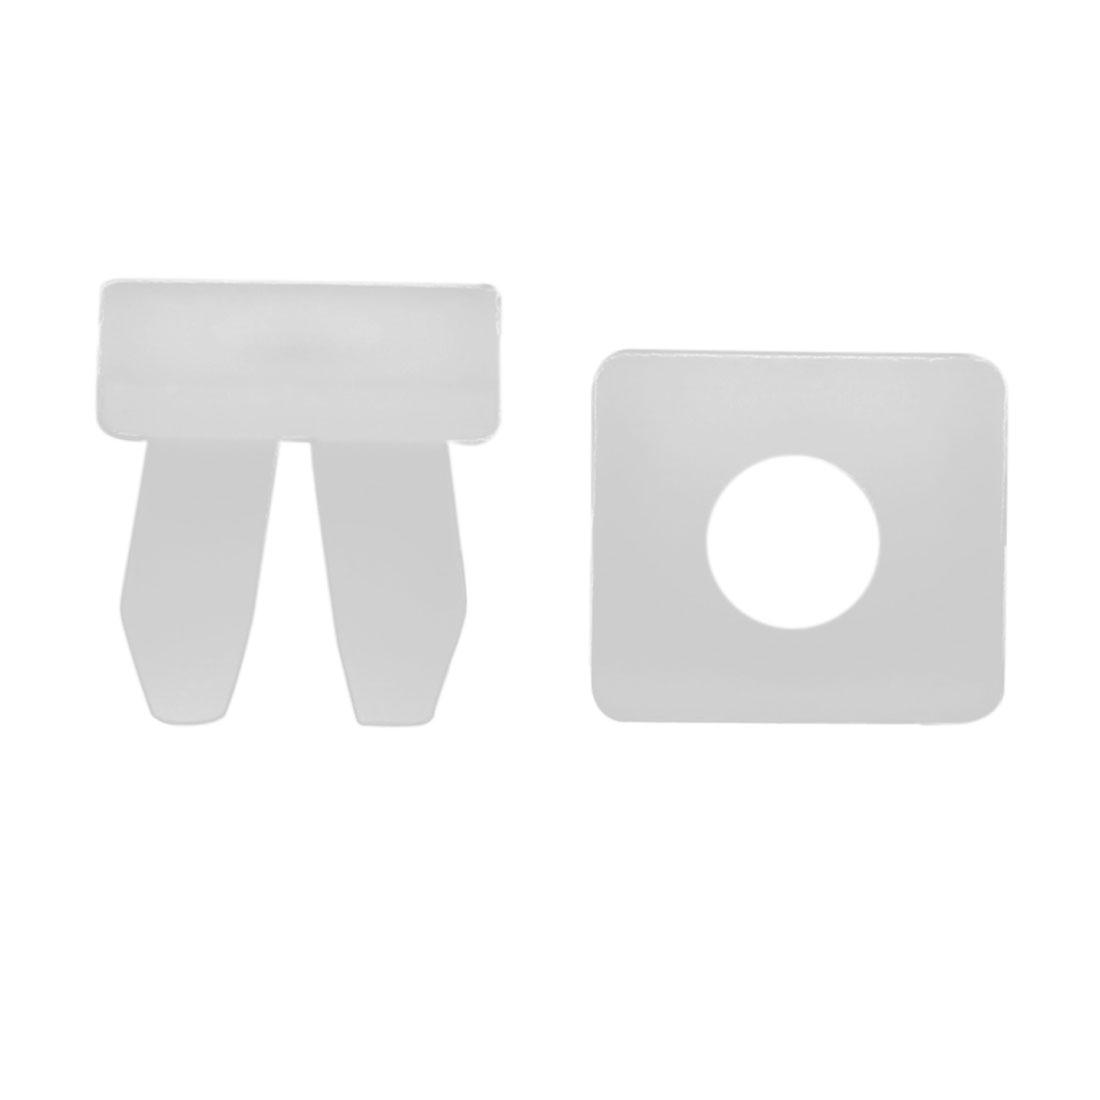 100Pcs 10mm Hole White Plastic Rivets Bumper Fender Fastener Clips for Car